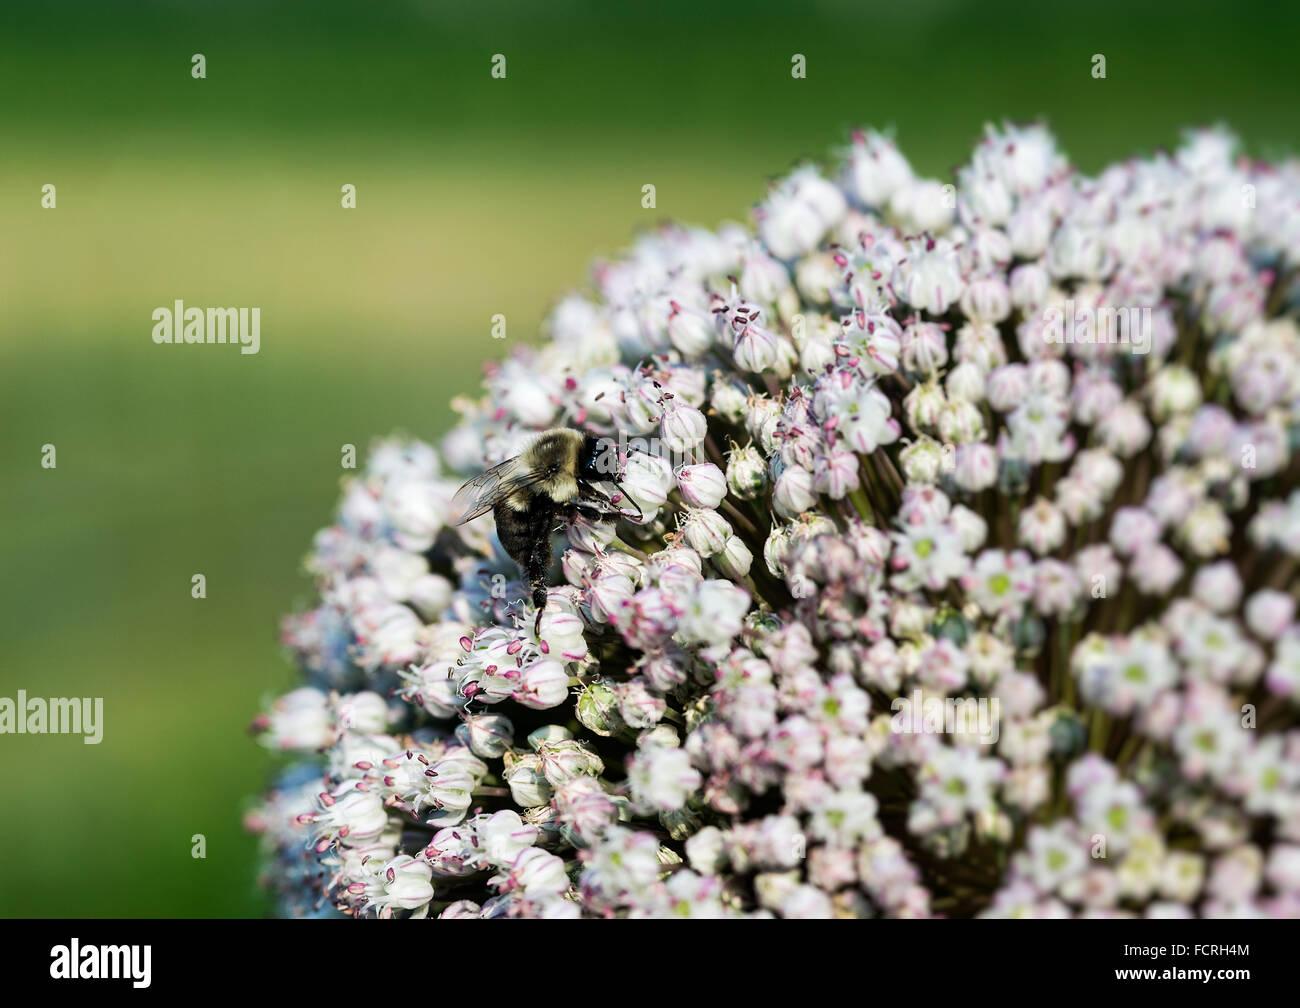 Bee on Onion flower, Allium. - Stock Image